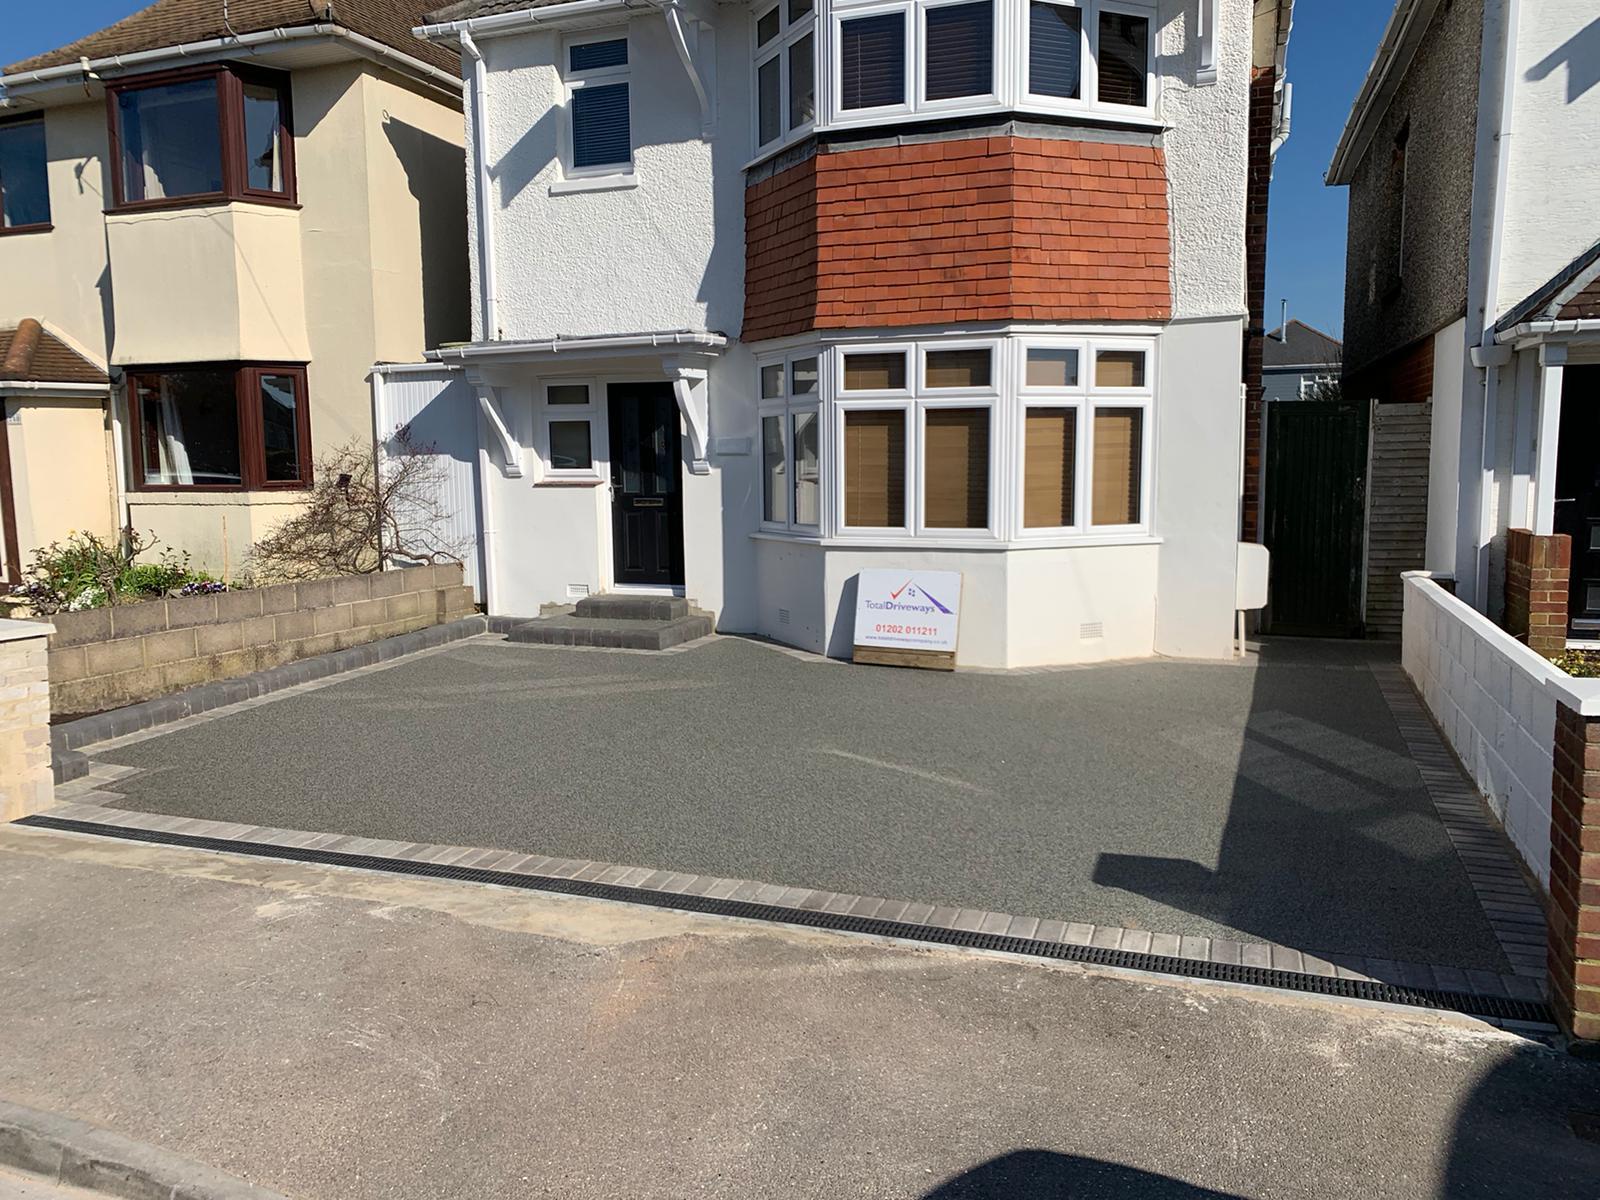 Resin Driveways Poole